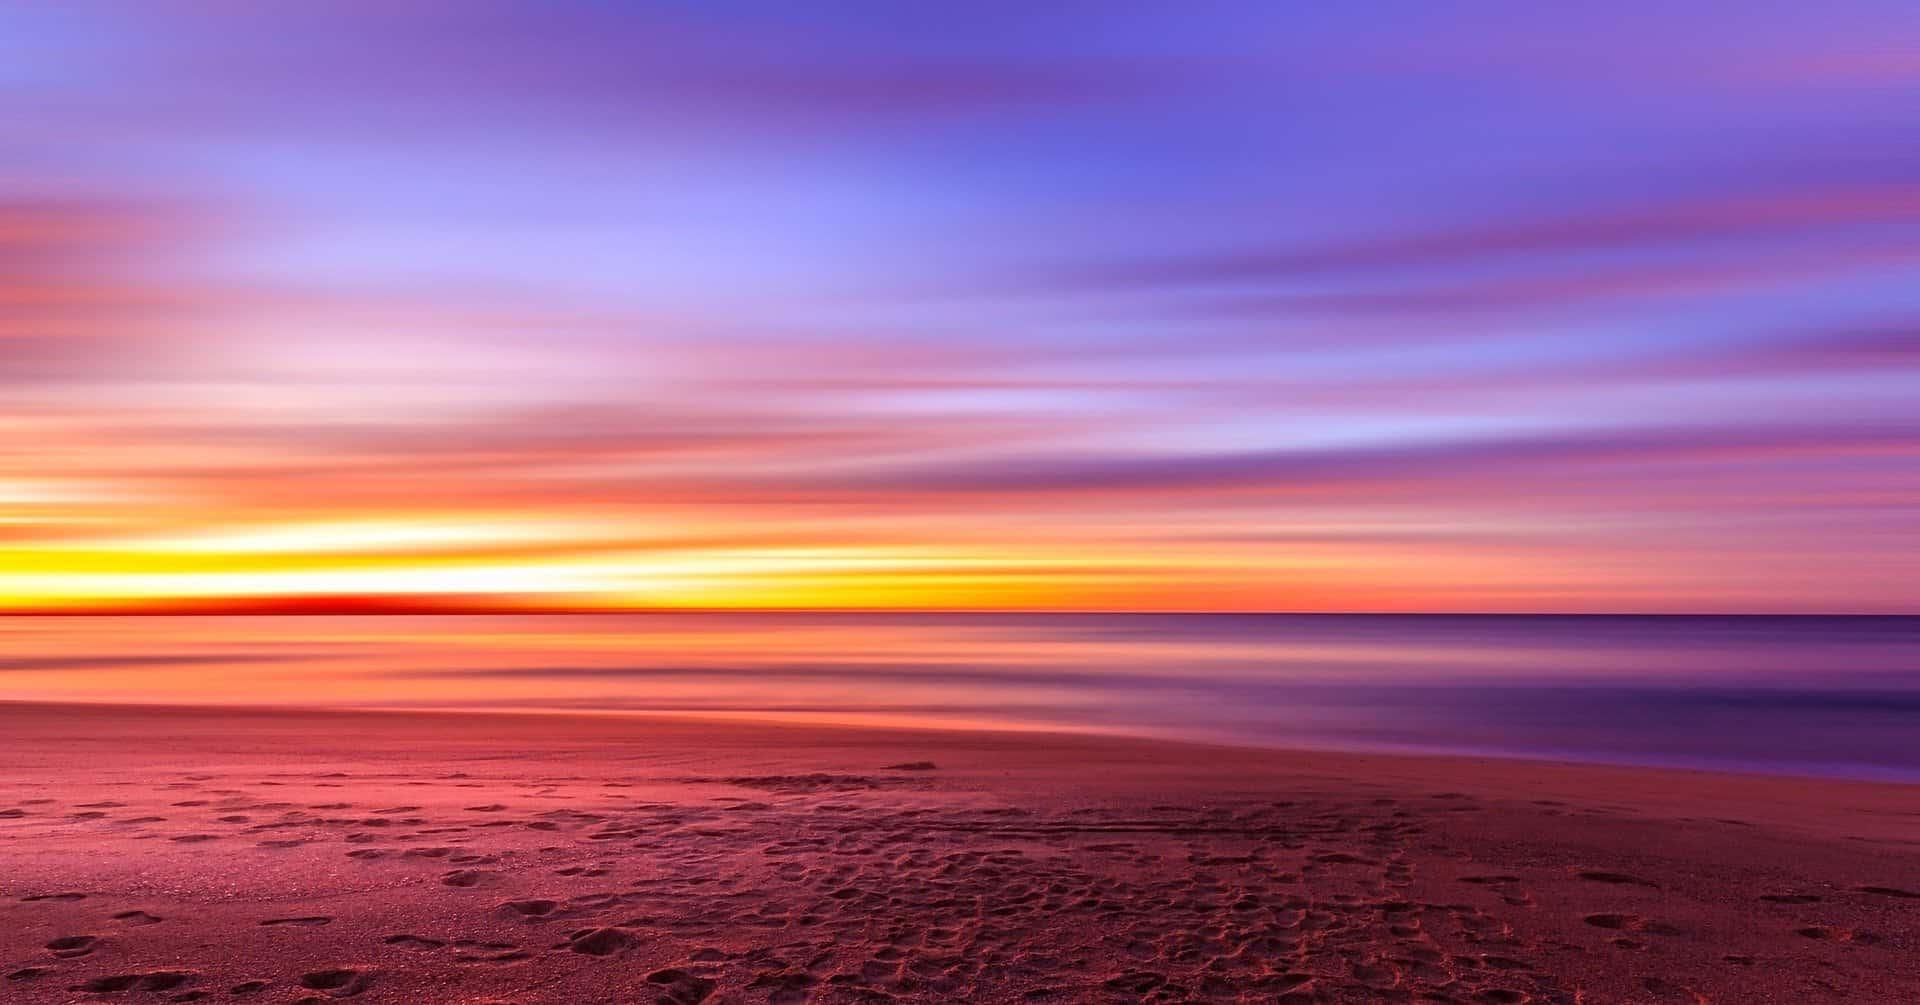 sunset-690333_1920